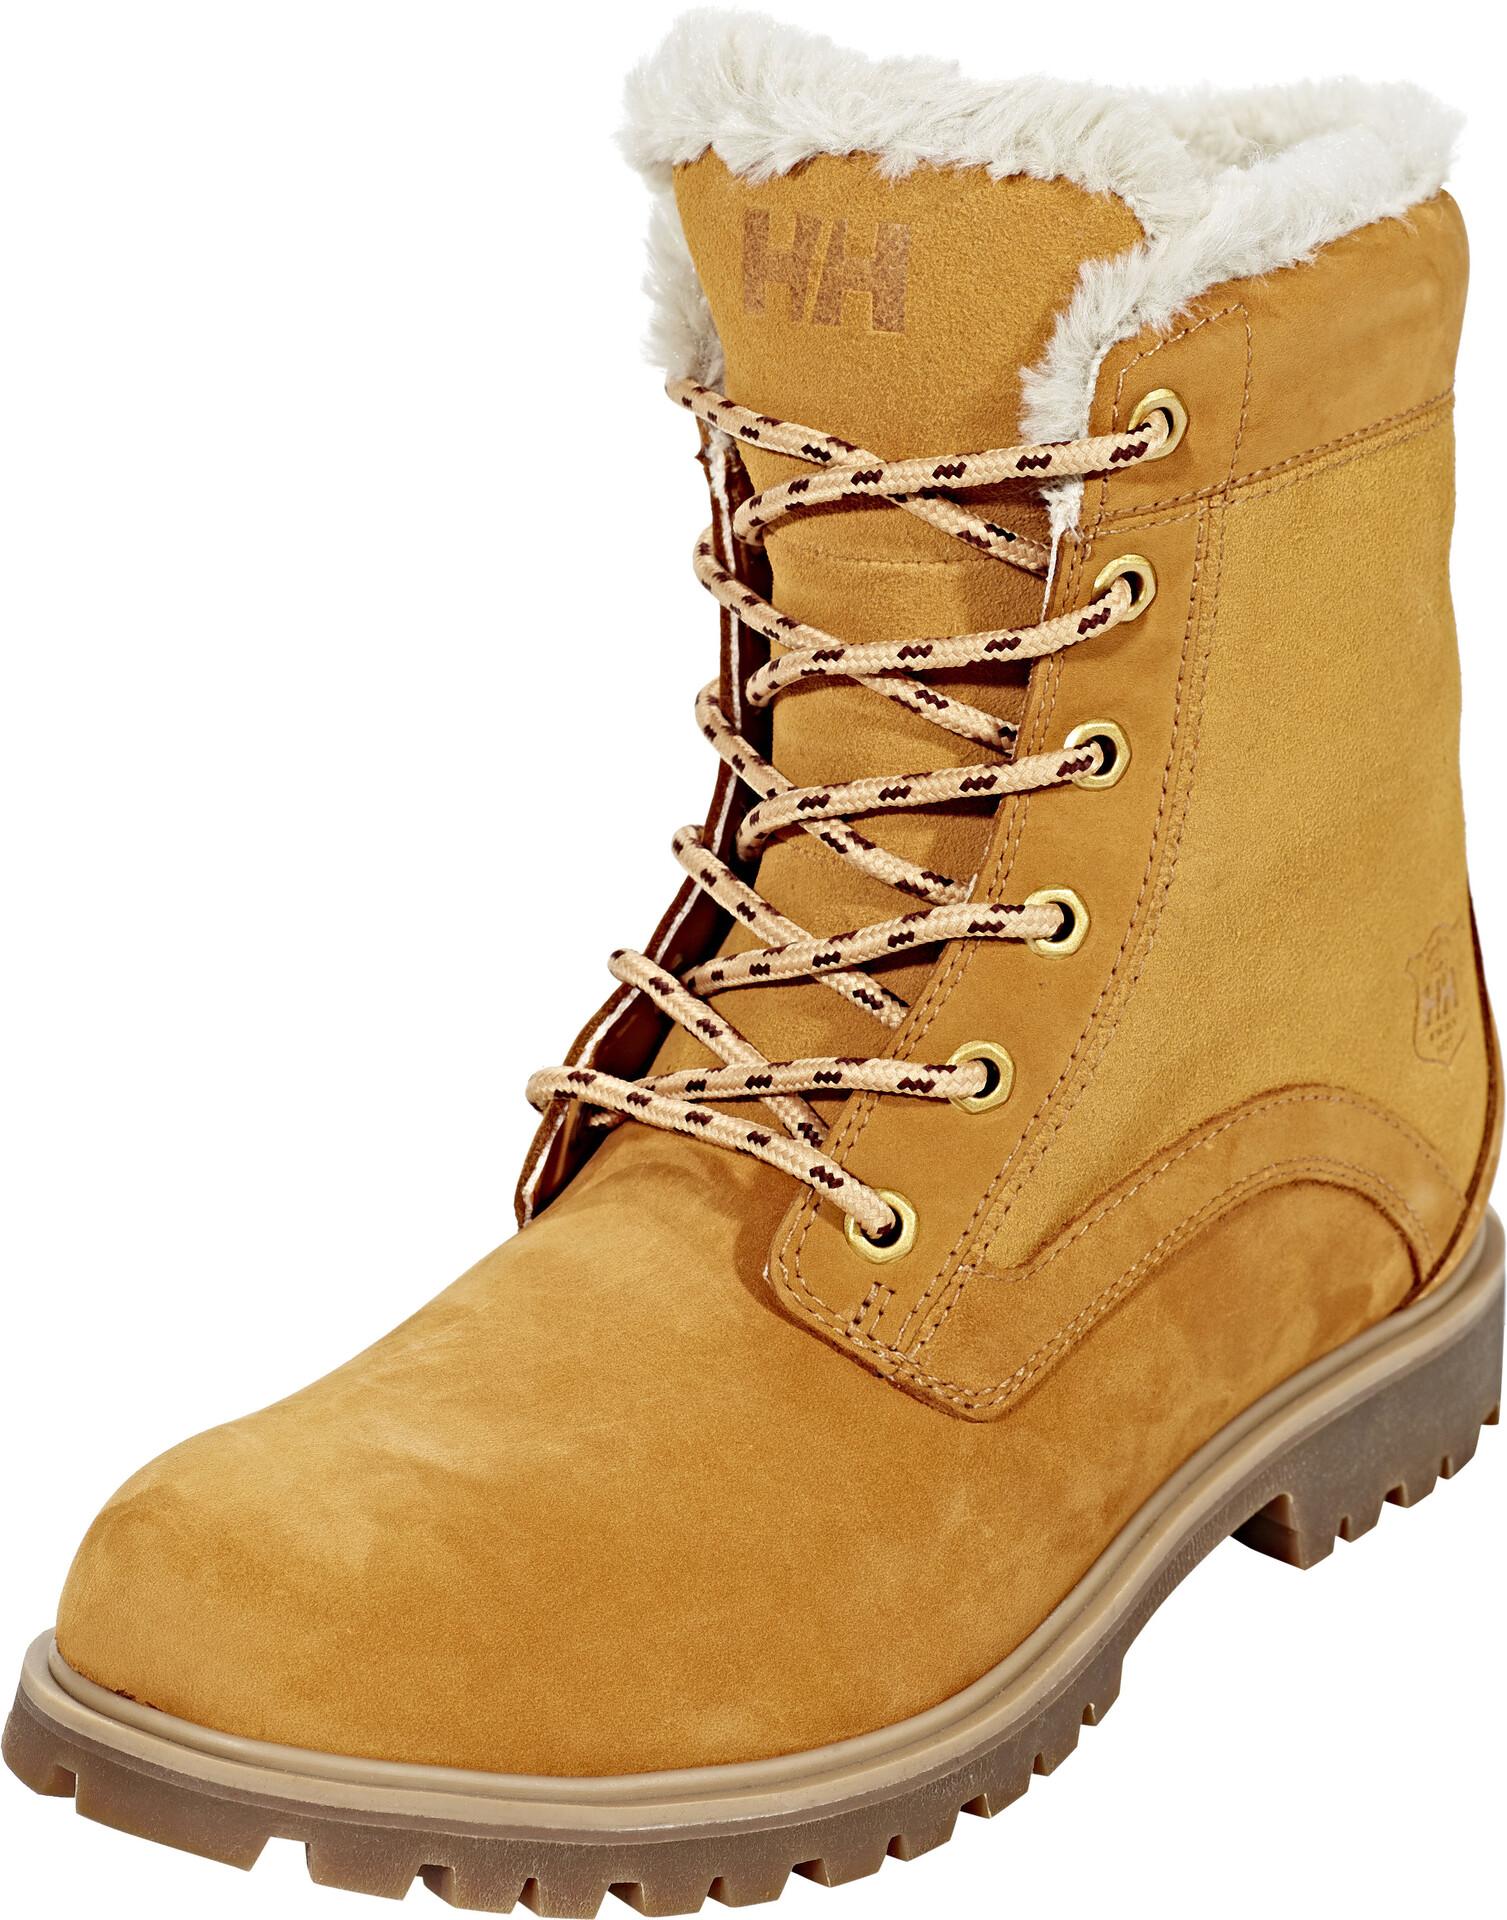 Marion Campz Helly Sur Chaussures Hansen Femme Marron 7vv5fq